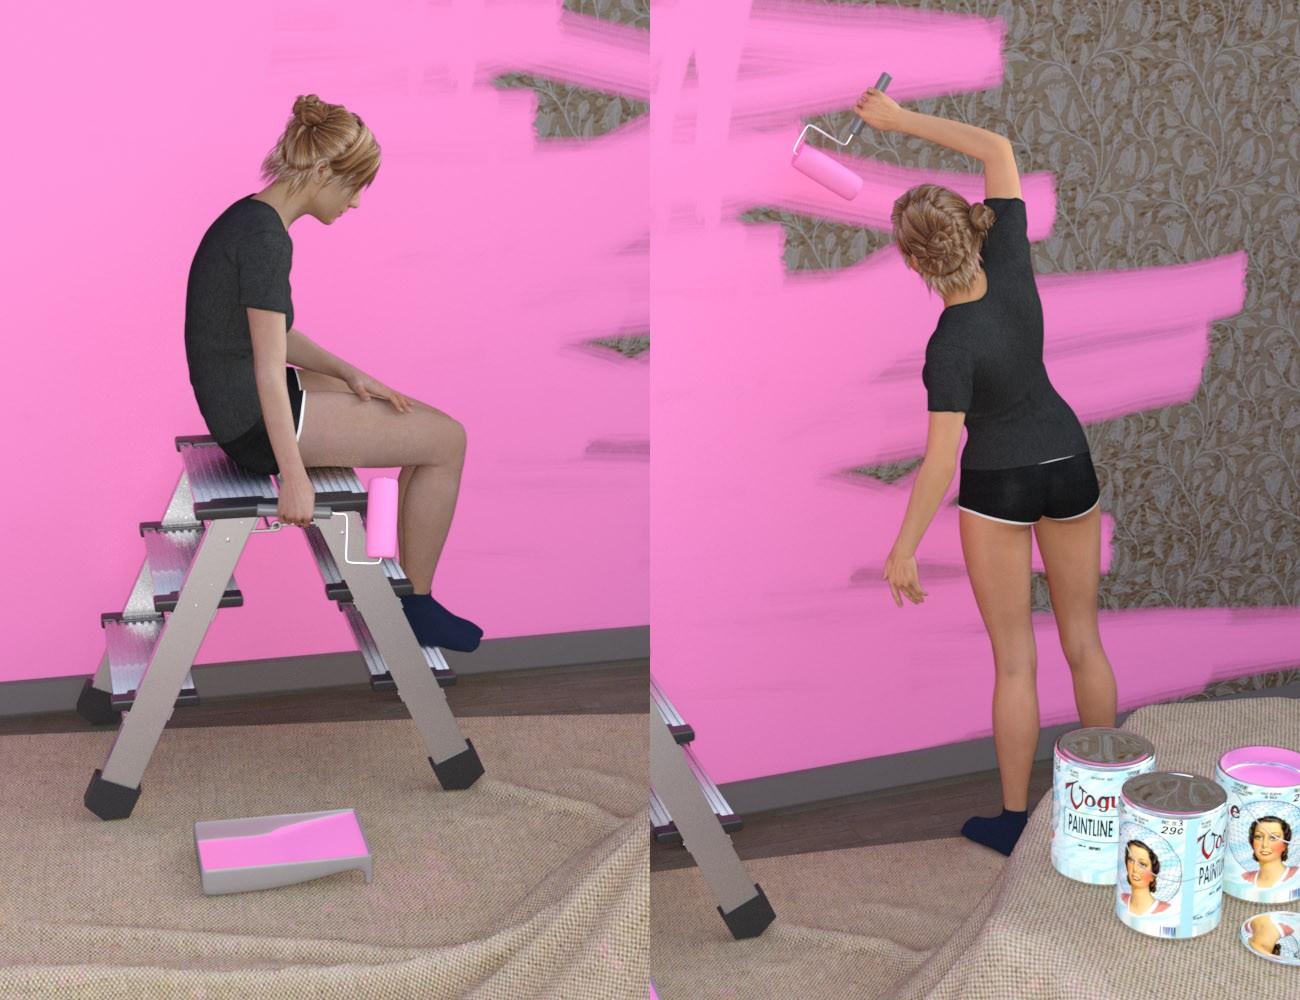 Download daz studio 3 for free daz 3d painting the for Living room 2 for daz studio